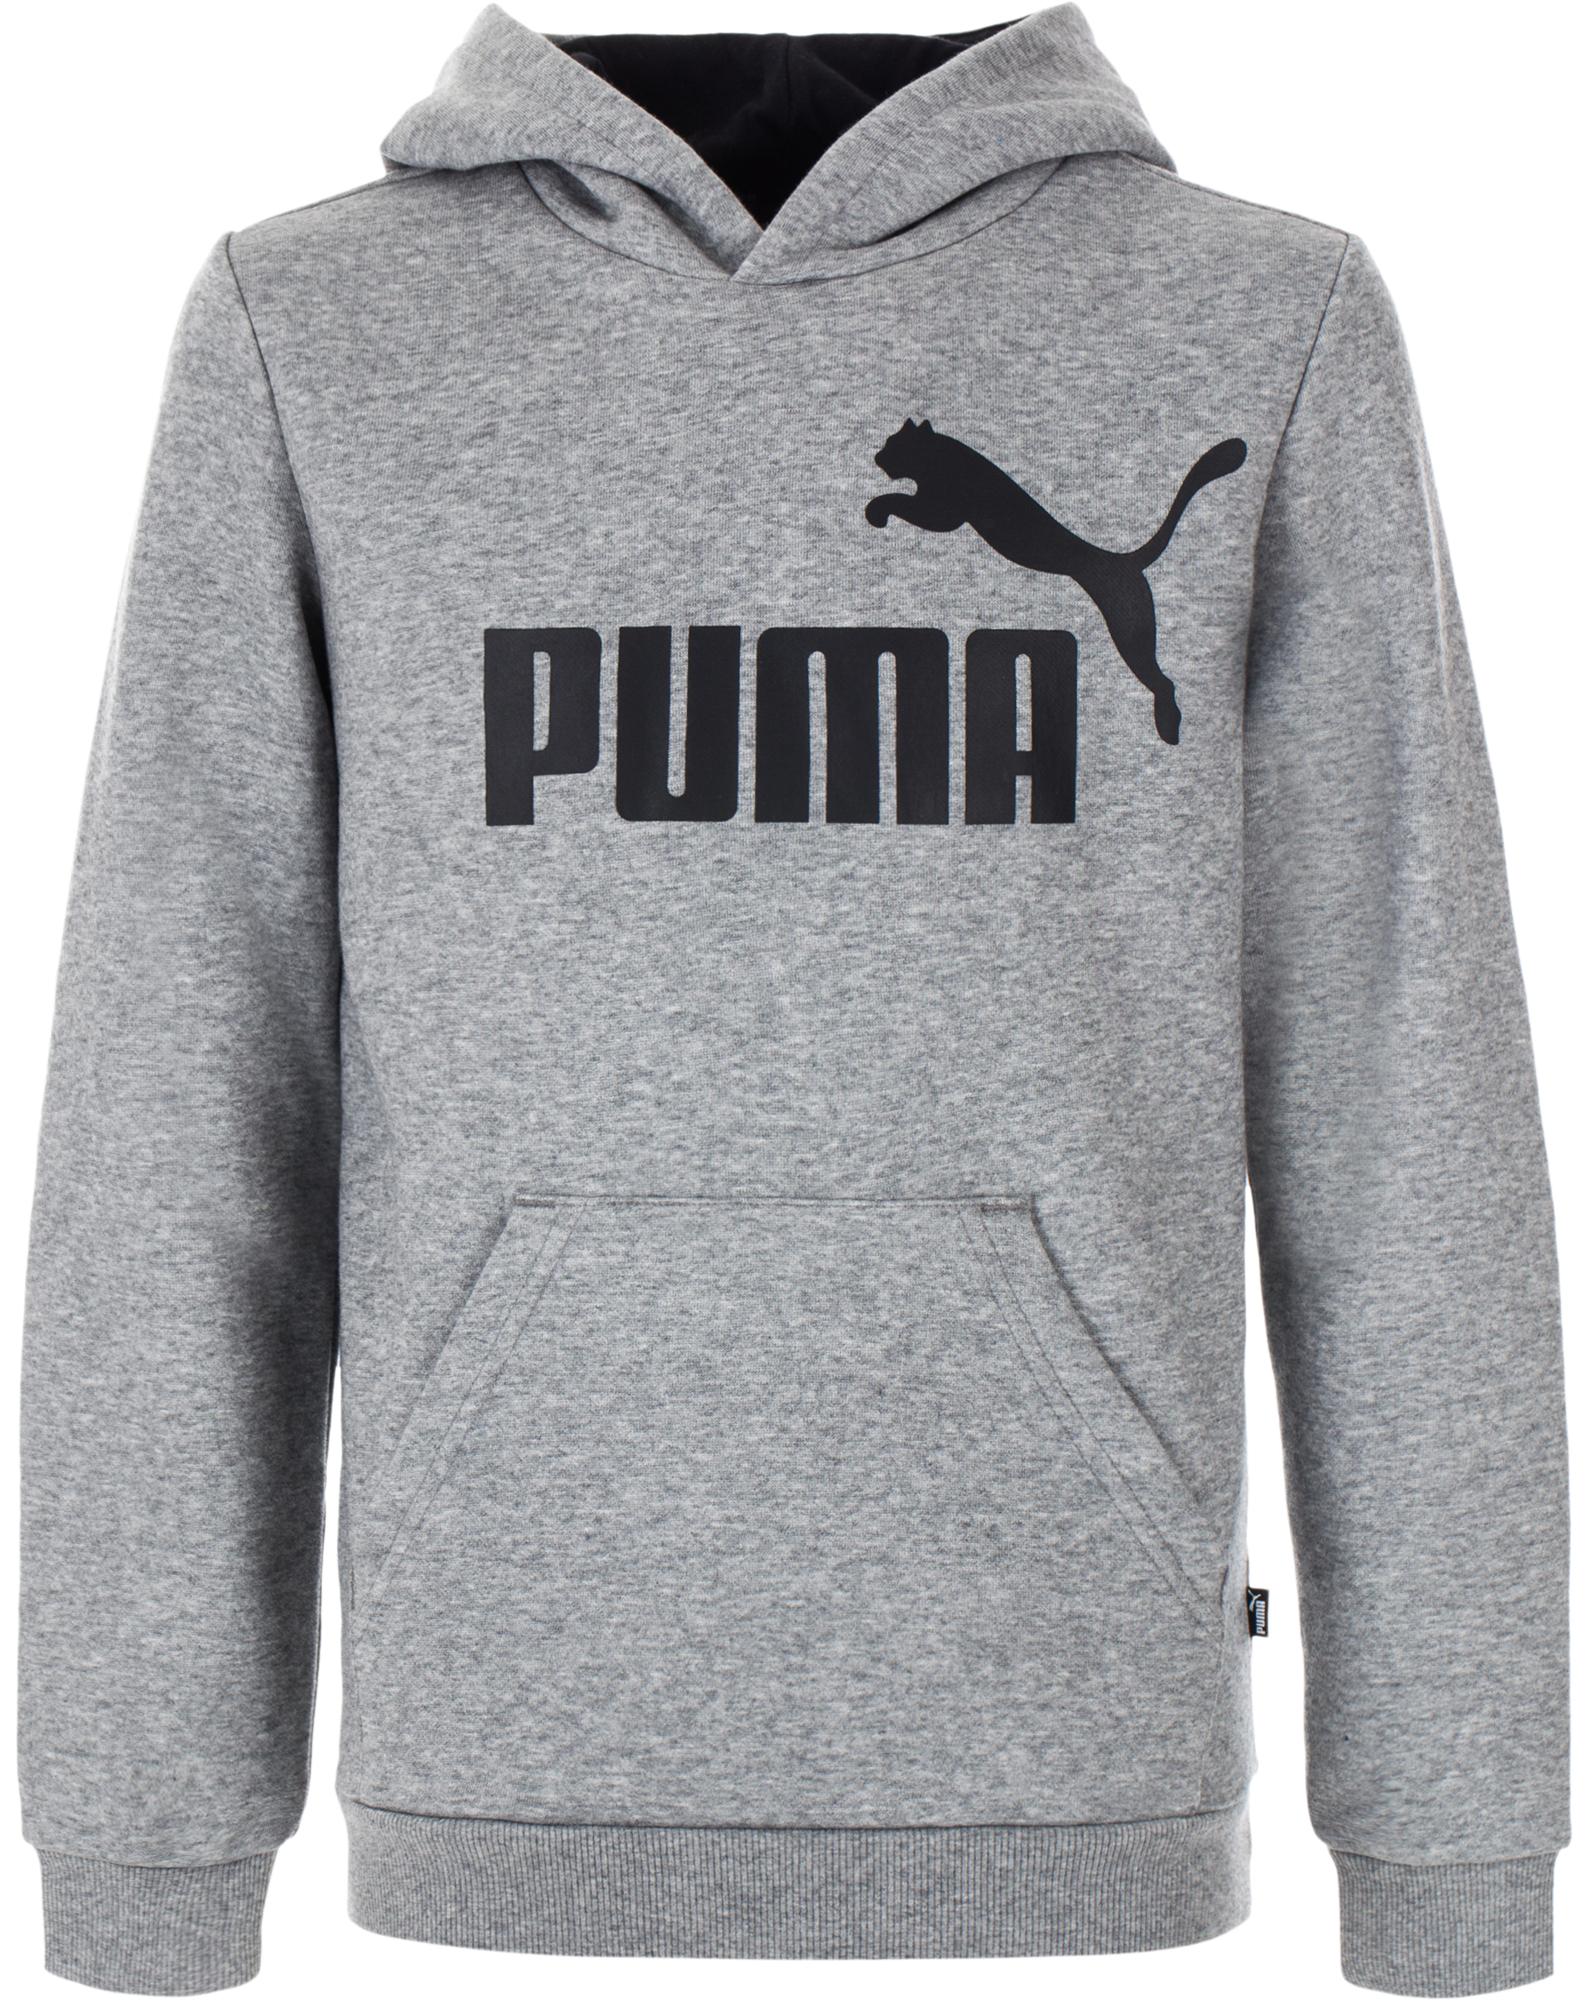 Puma Джемпер для мальчиков Puma ESS Logo, размер 140